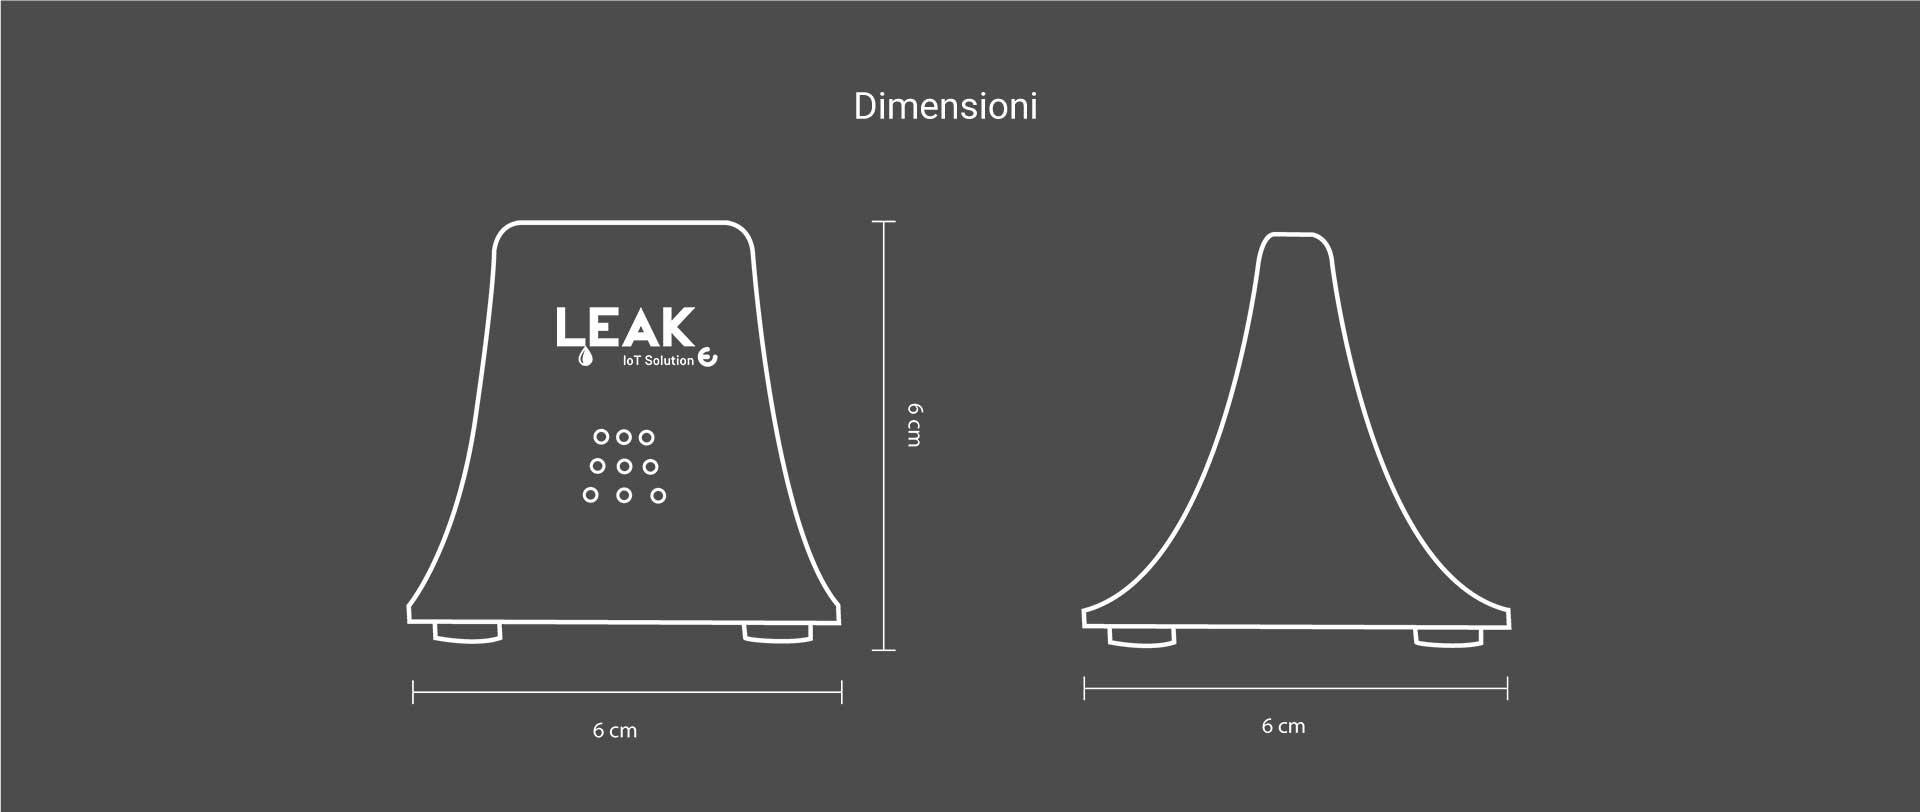 leak dimensioni